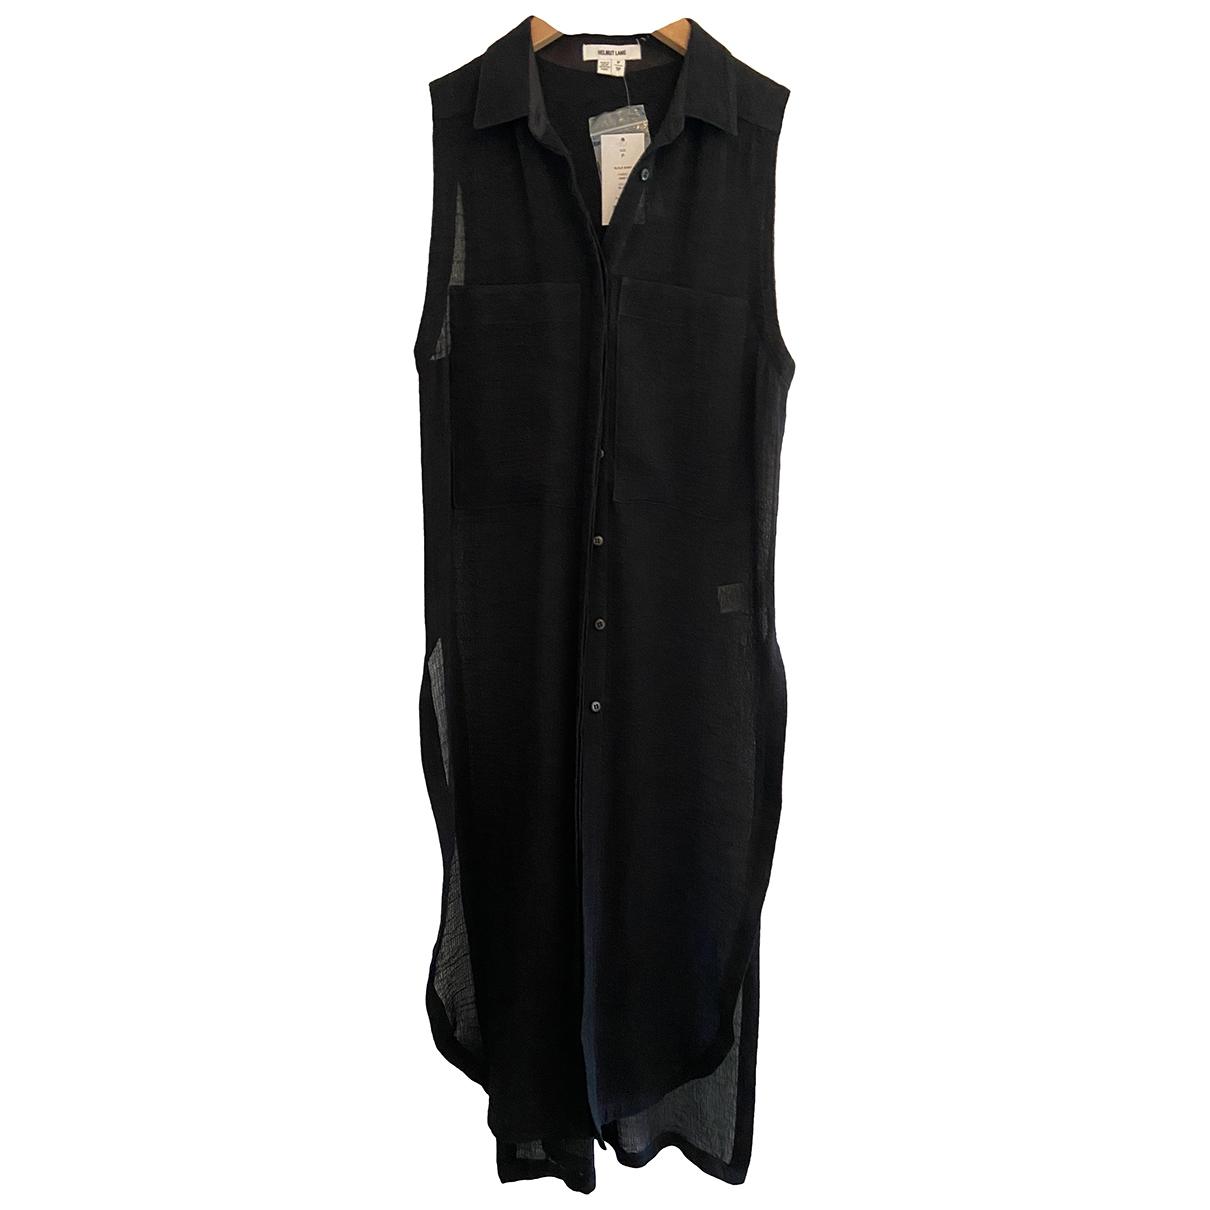 Helmut Lang \N Black Cotton dress for Women XS International